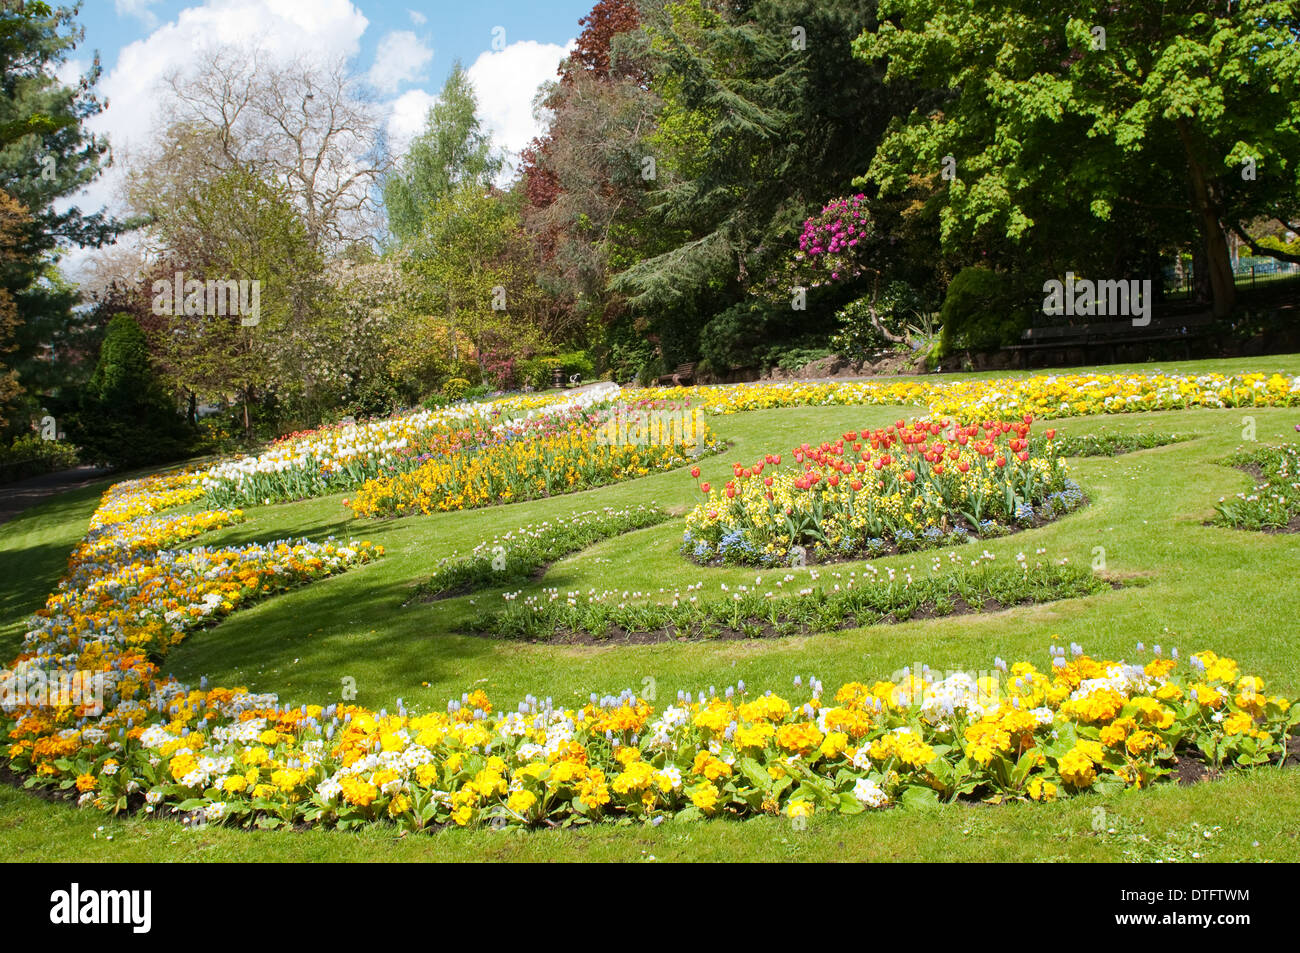 The pretty flower gardens at the arboretum city park in nottingham the pretty flower gardens at the arboretum city park in nottingham nottinghamshire england uk mightylinksfo